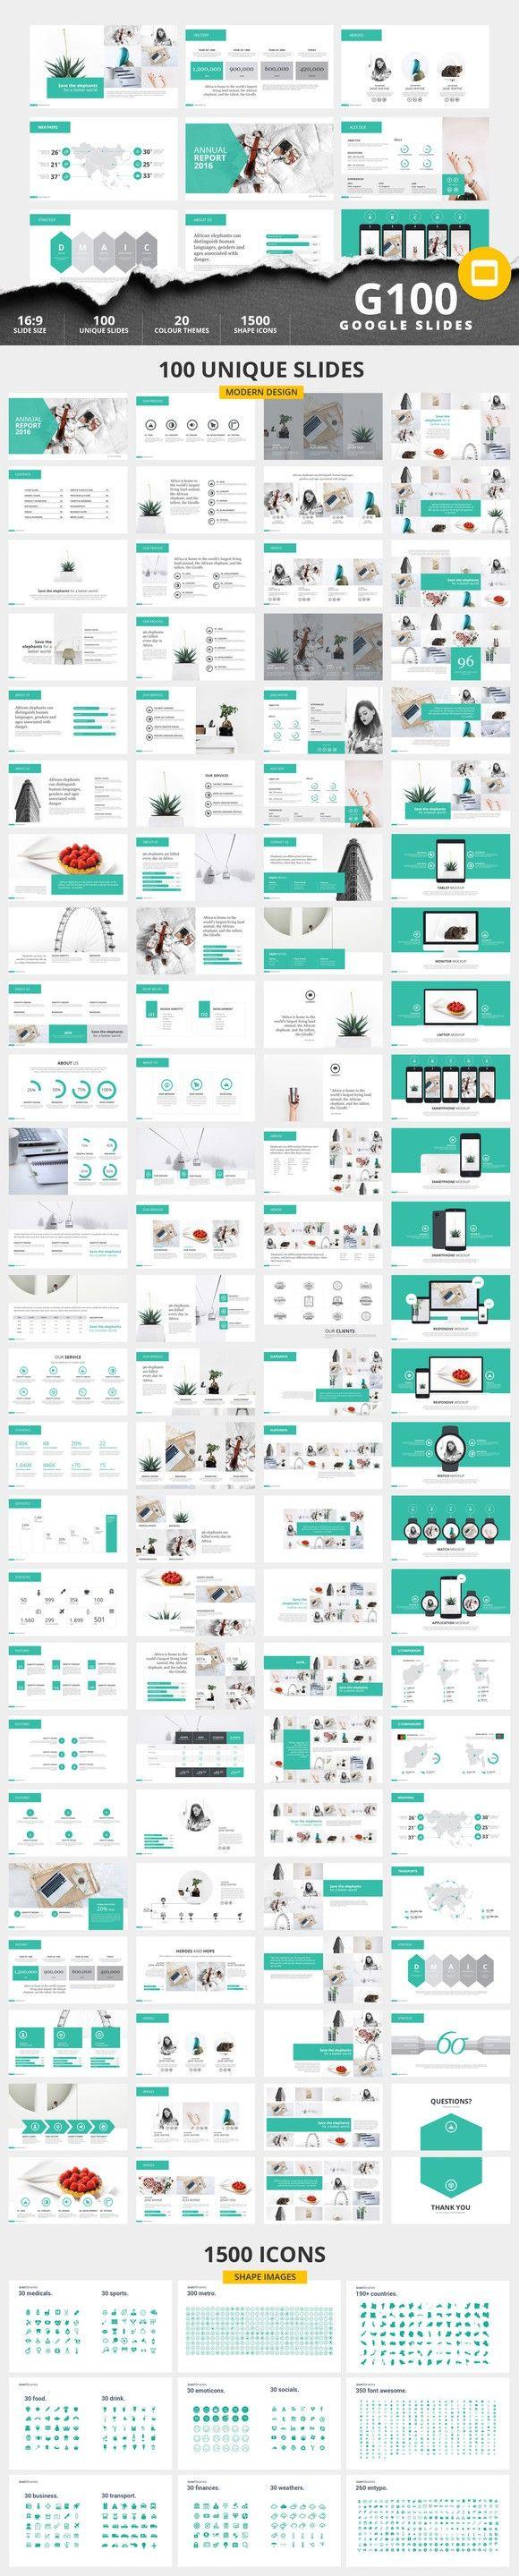 G100 Magazine GoogleSlides Template. Presentation Templates. $10.00